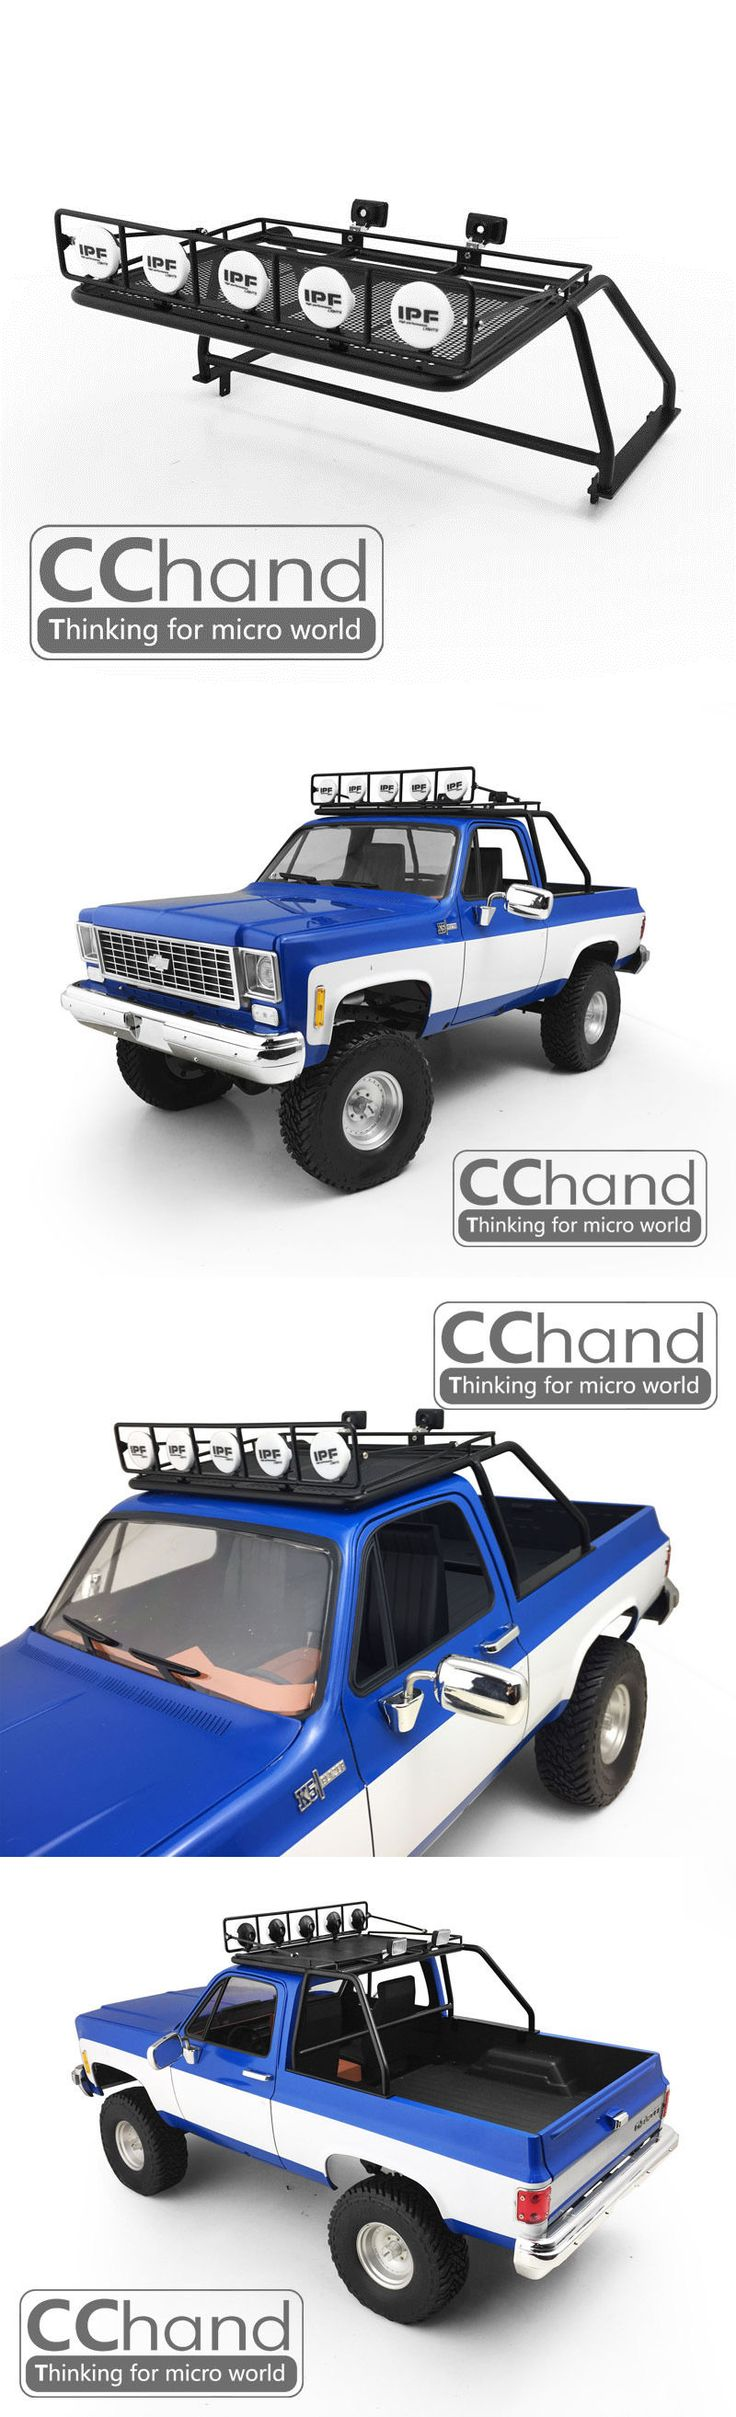 Empty Boxes 180311: 1 10 Chevrolet Blazer Roof Rack [Black] -> BUY IT NOW ONLY: $156.99 on eBay!